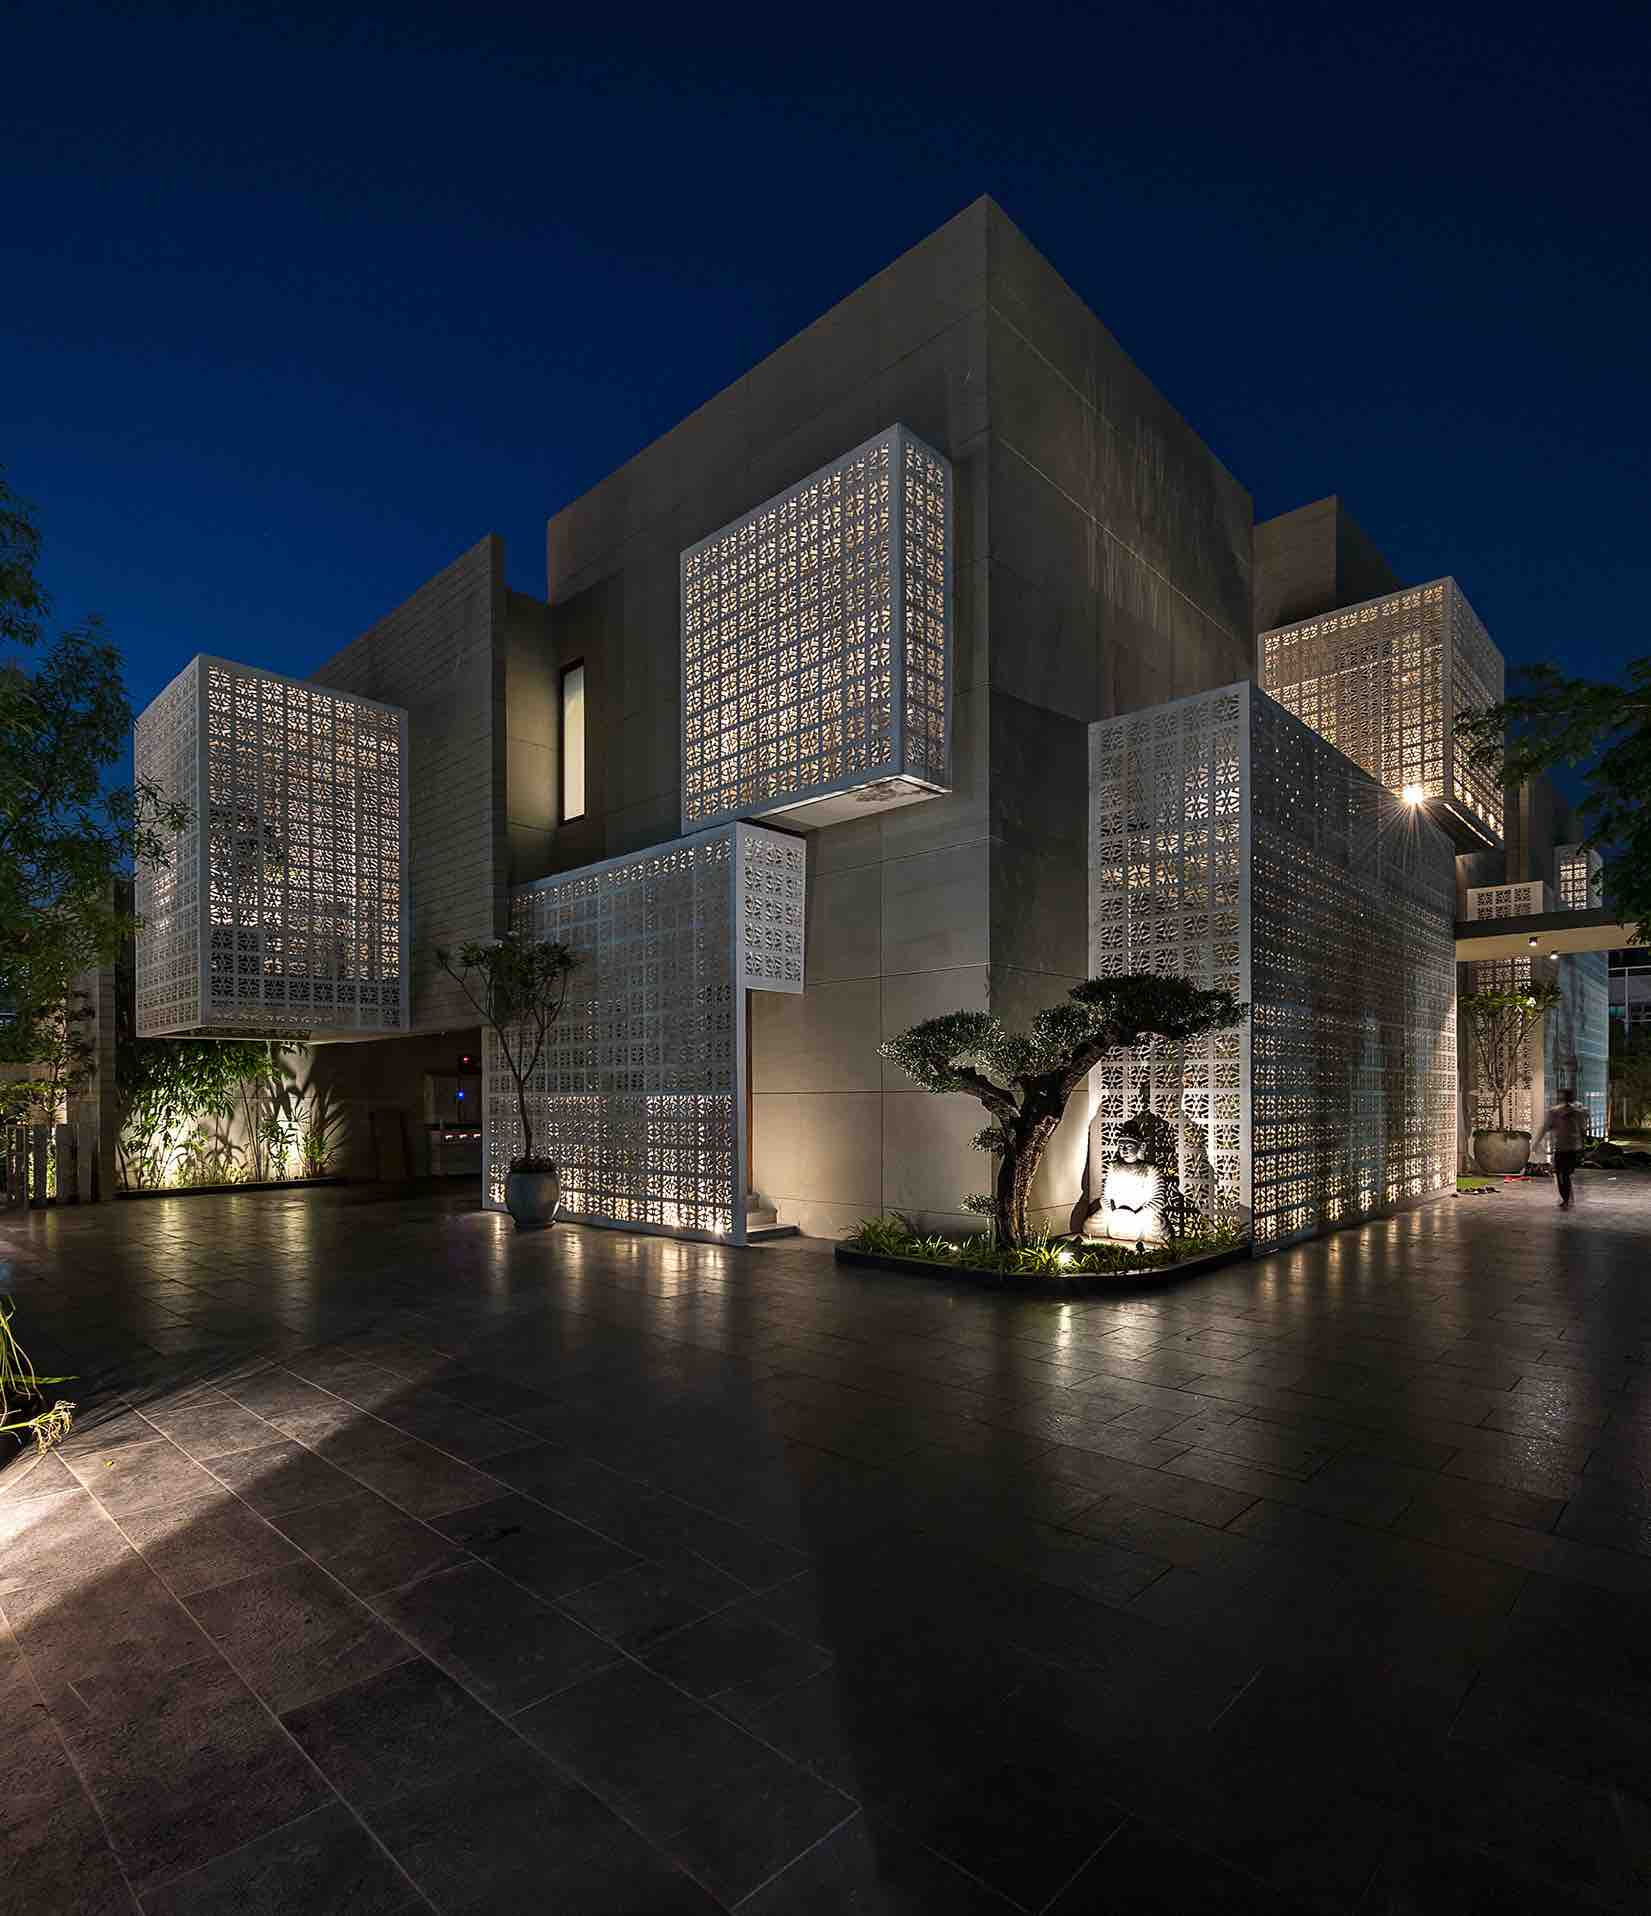 18_Screens_Sanjay_Puri_architects_india_amazingarchitecture_018.jpg